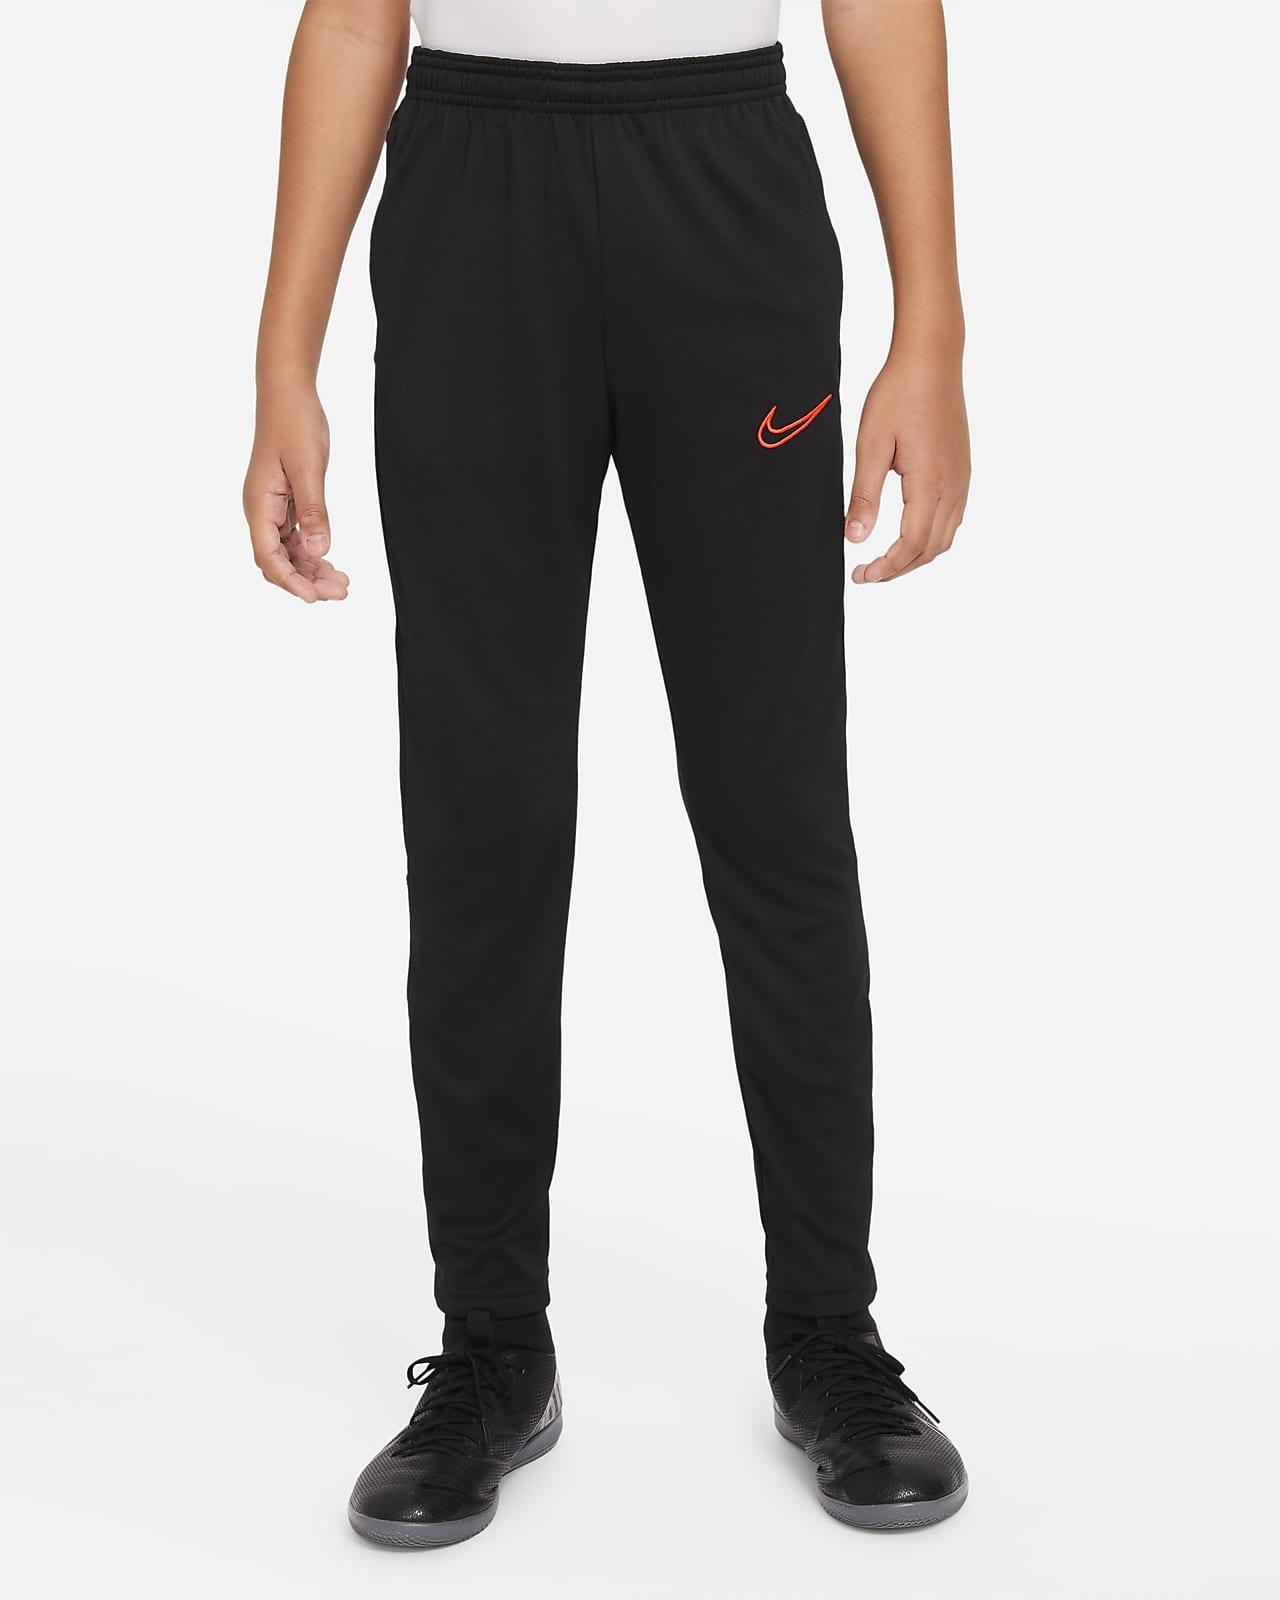 Nike Dri-FIT Academy Older Kids' Knit Football Pants